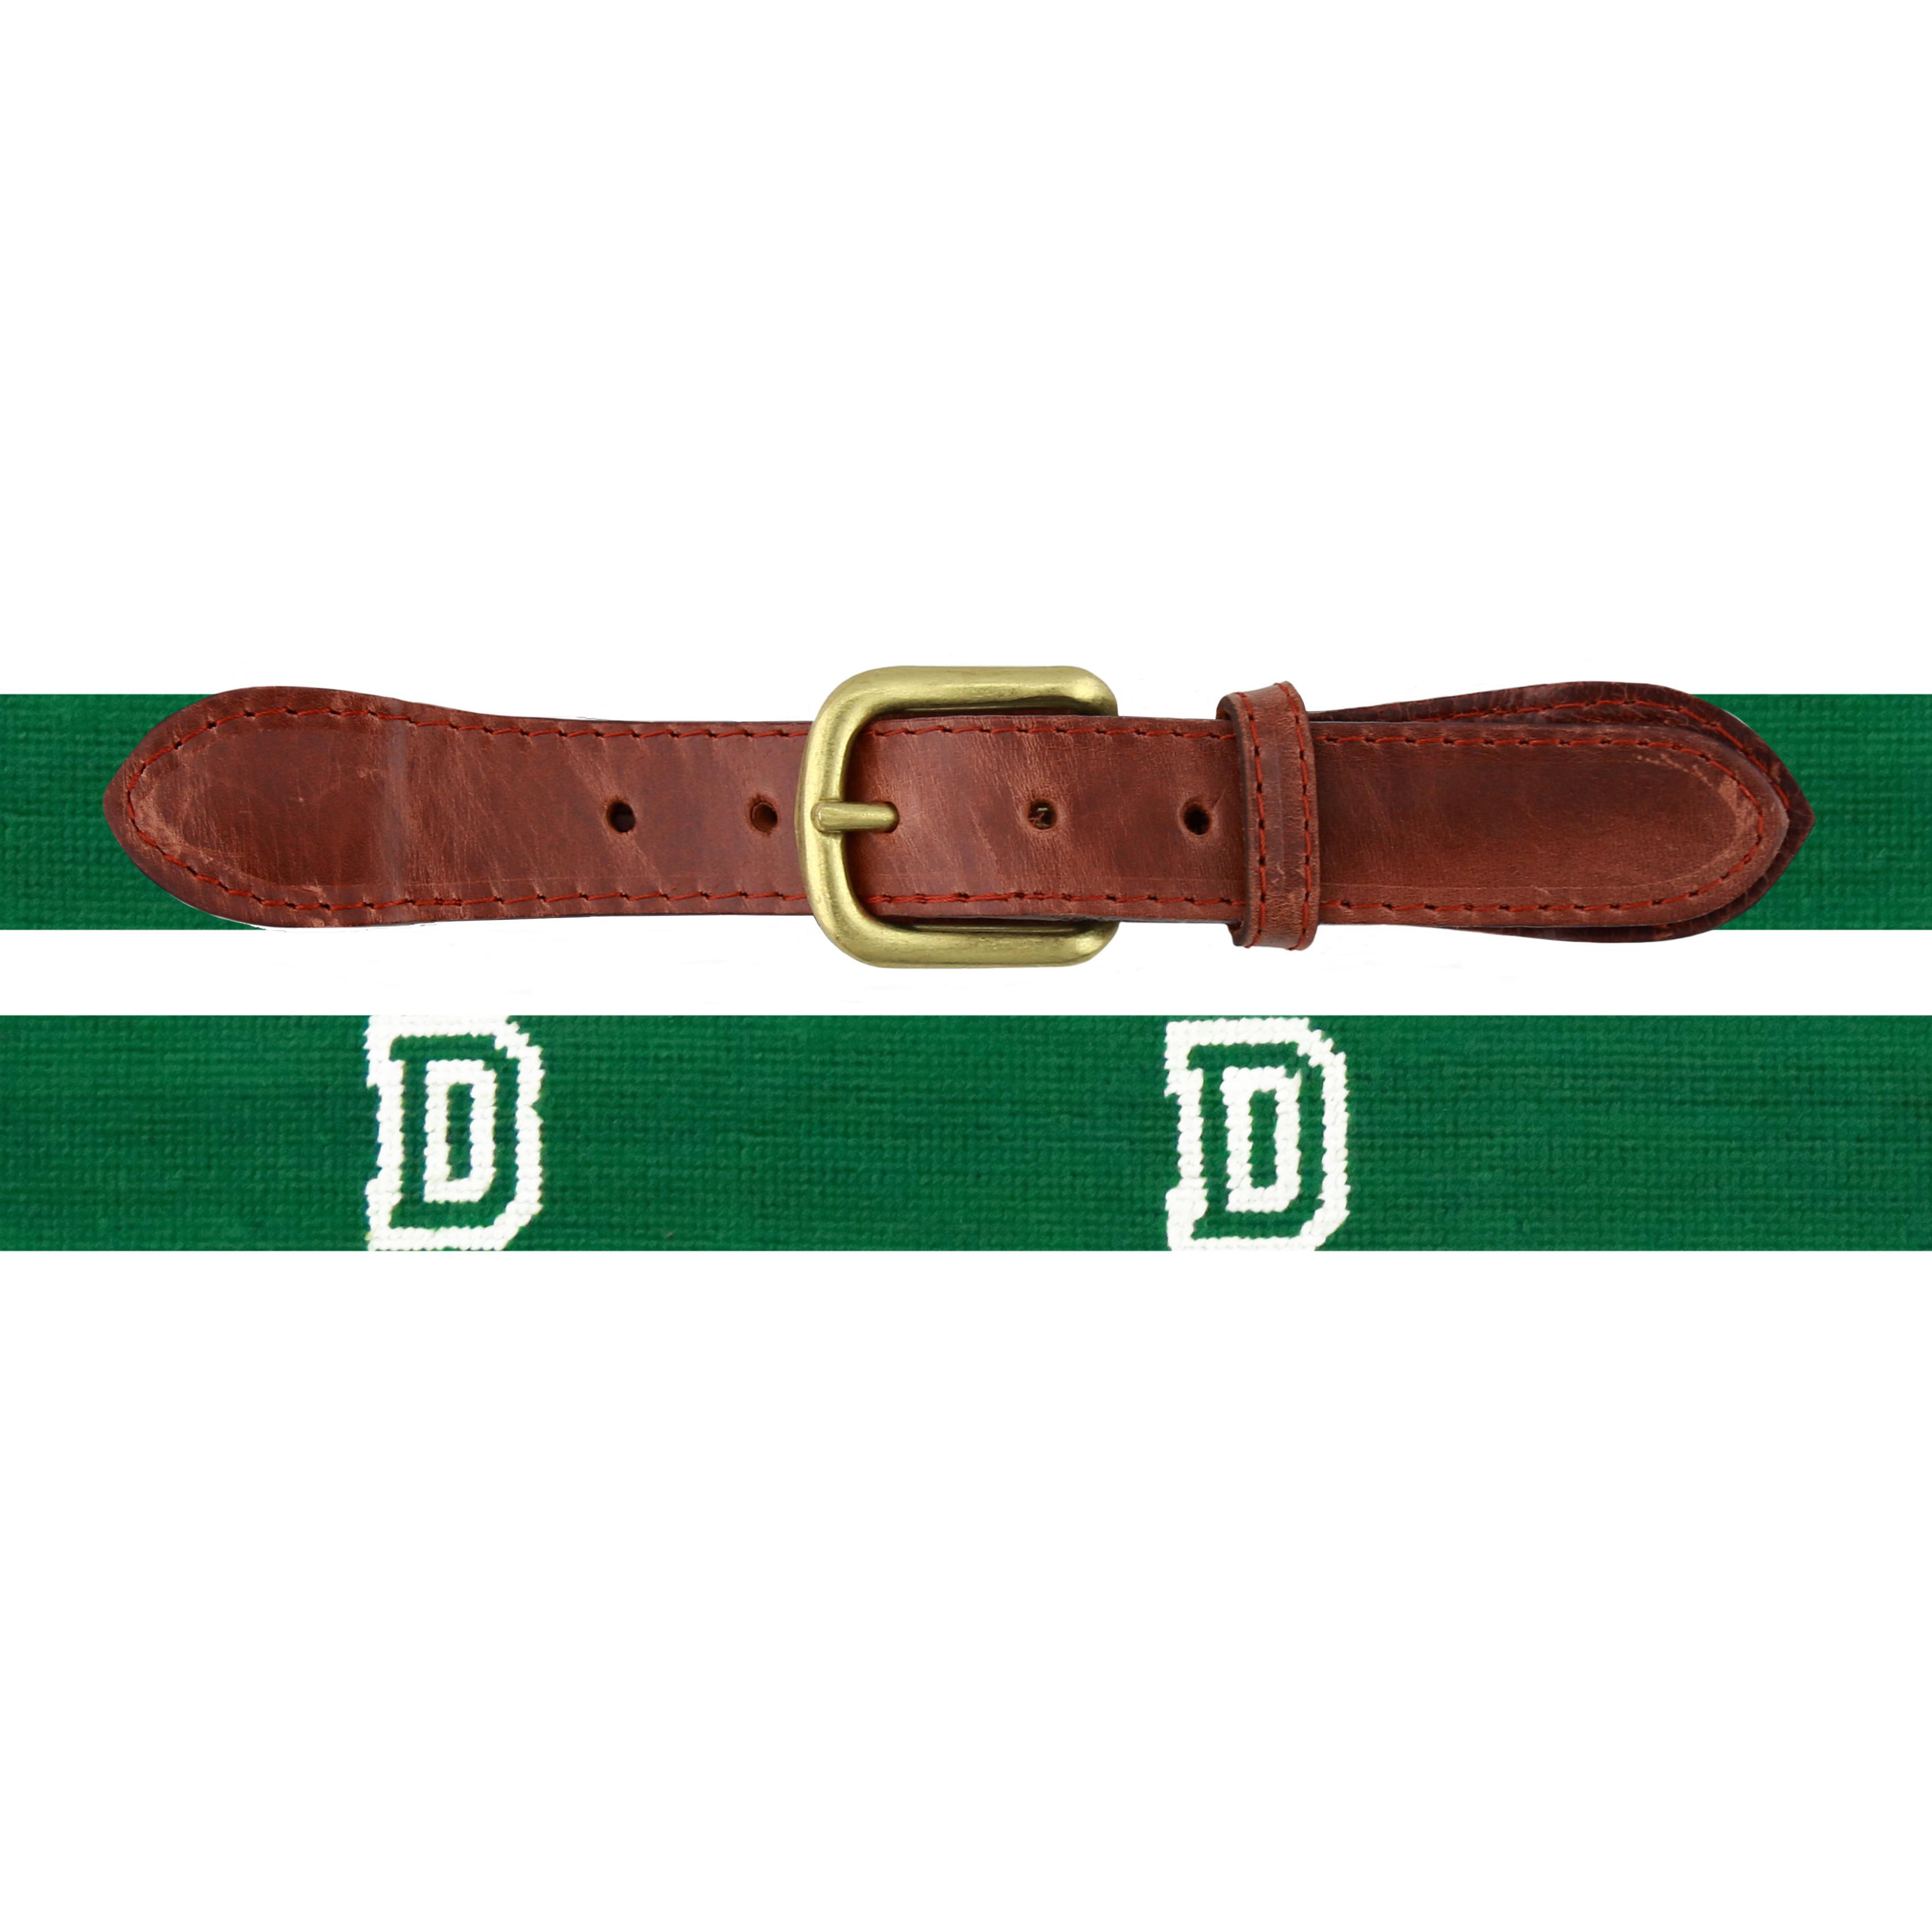 Dartmouth Men's Cotton Belt - Image 2